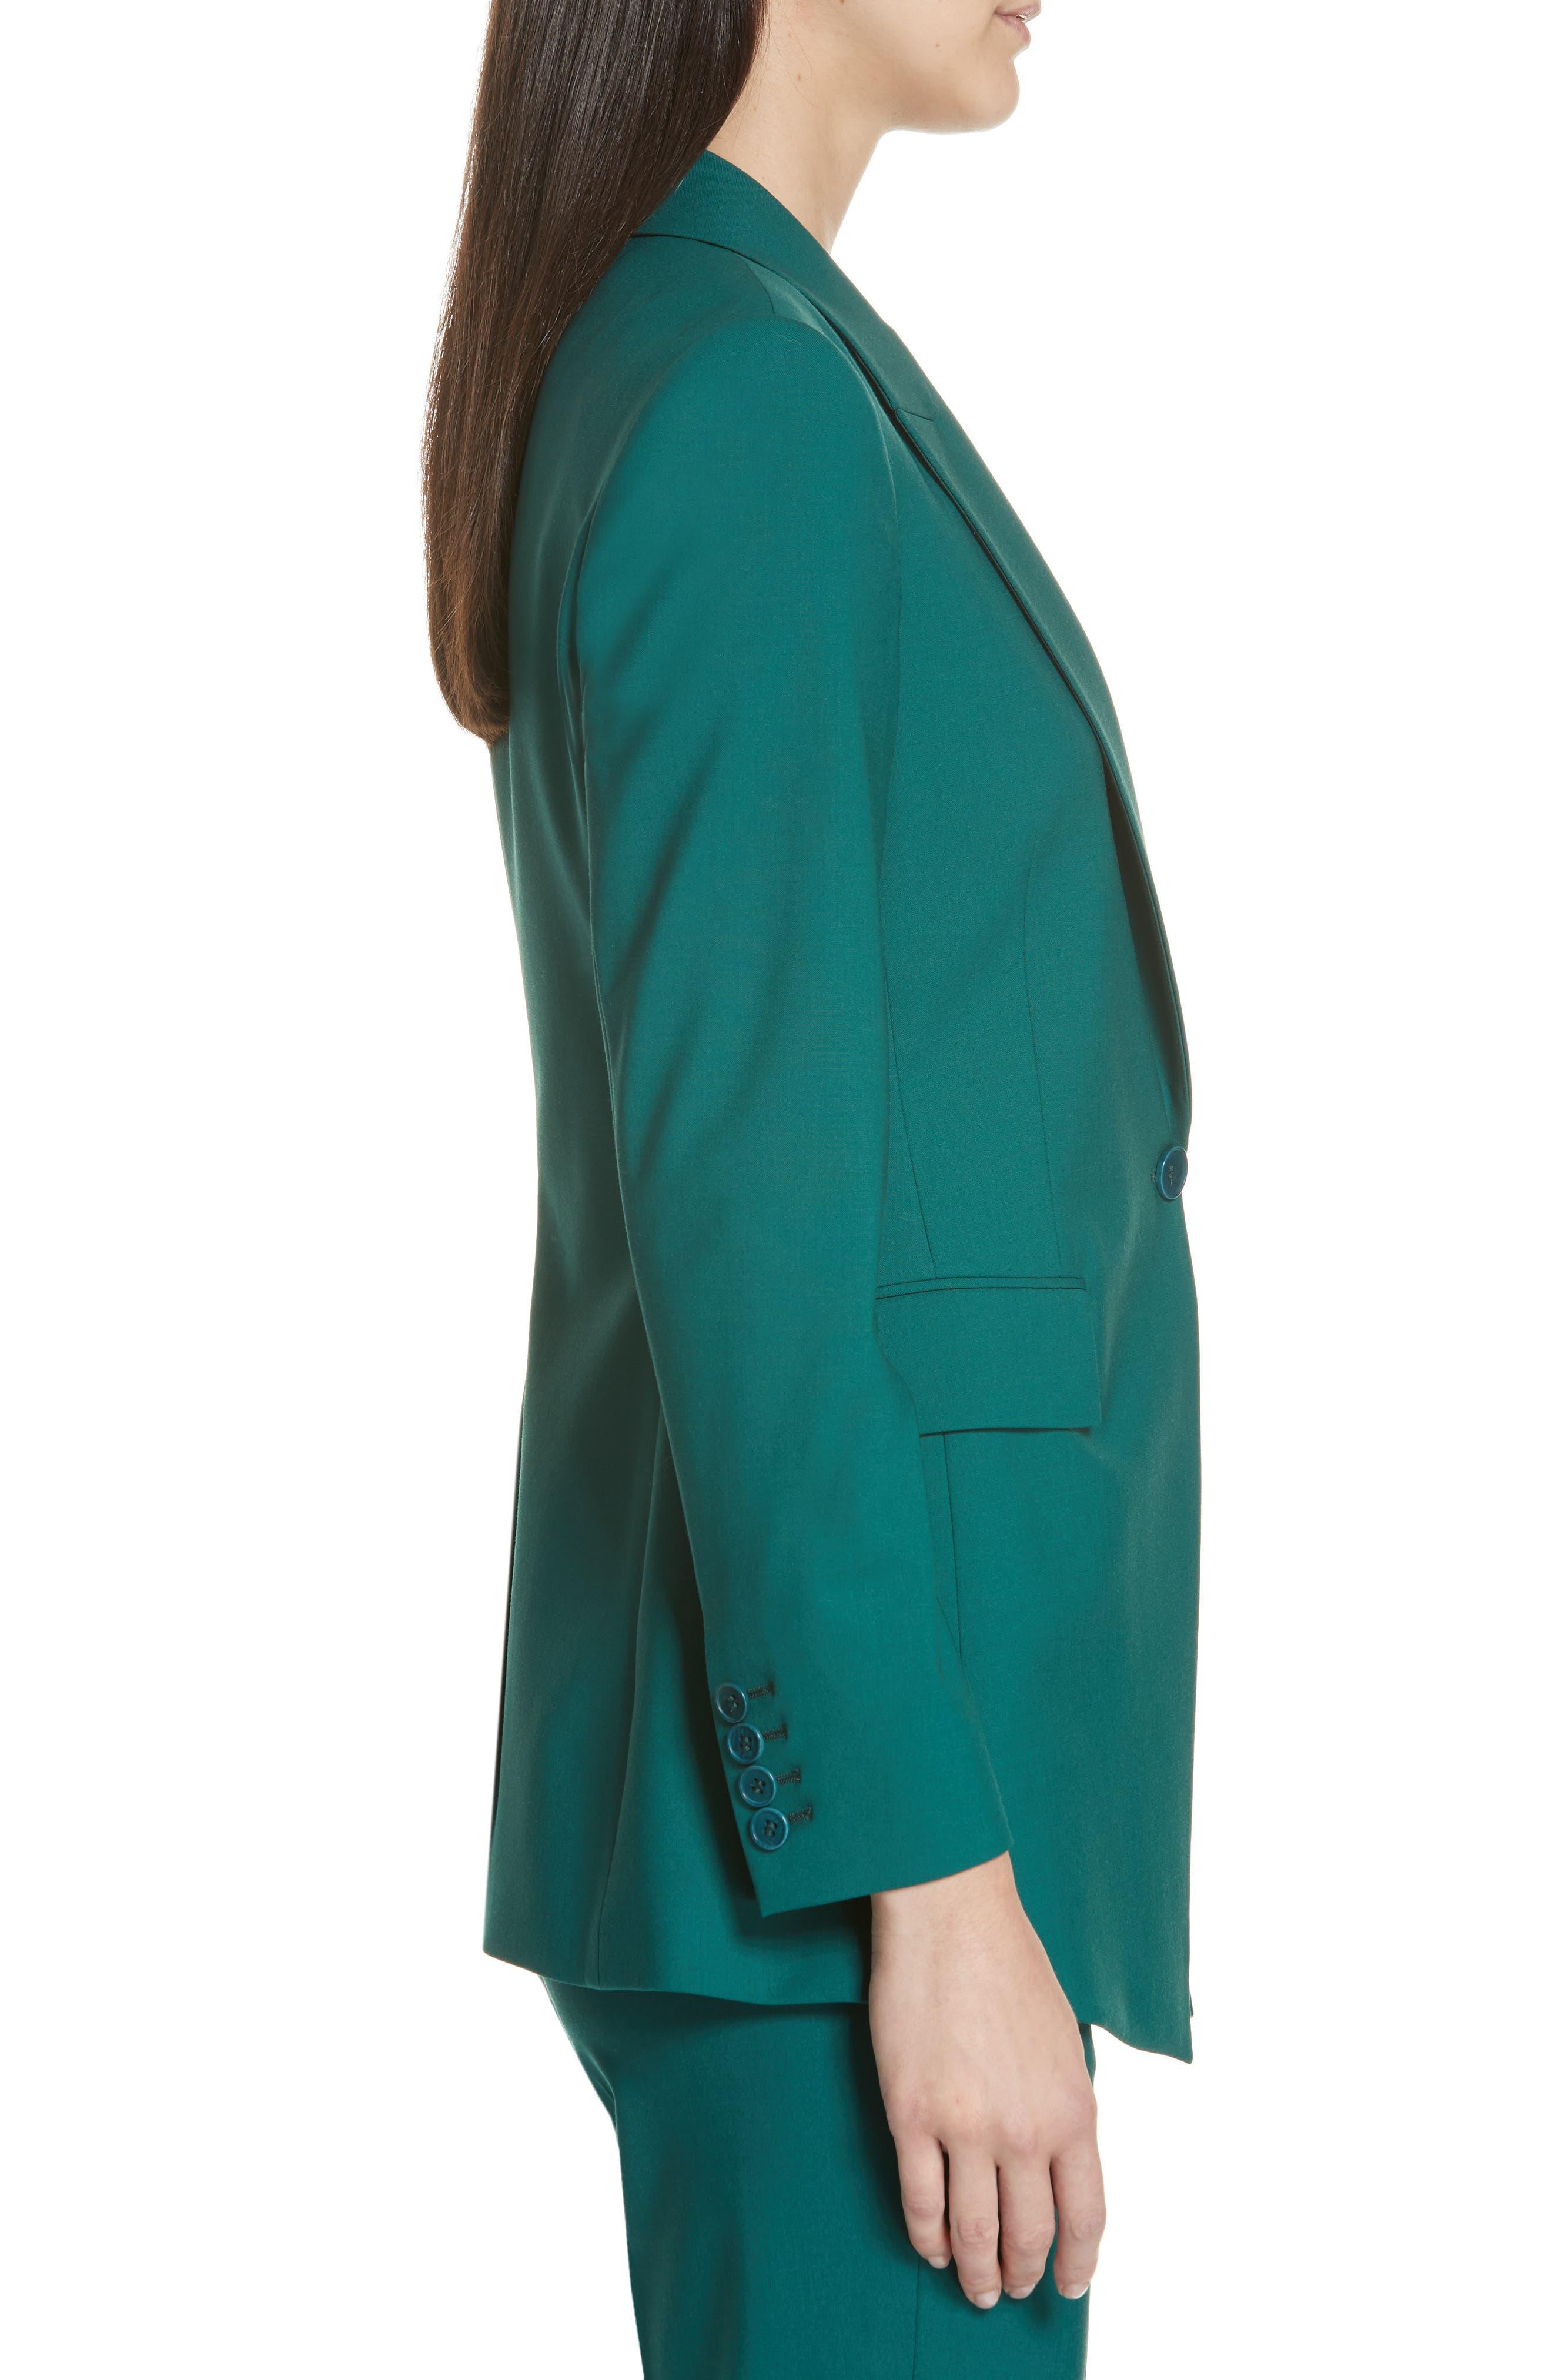 Etienette B Good Wool Suit Jacket,                             Alternate thumbnail 18, color,